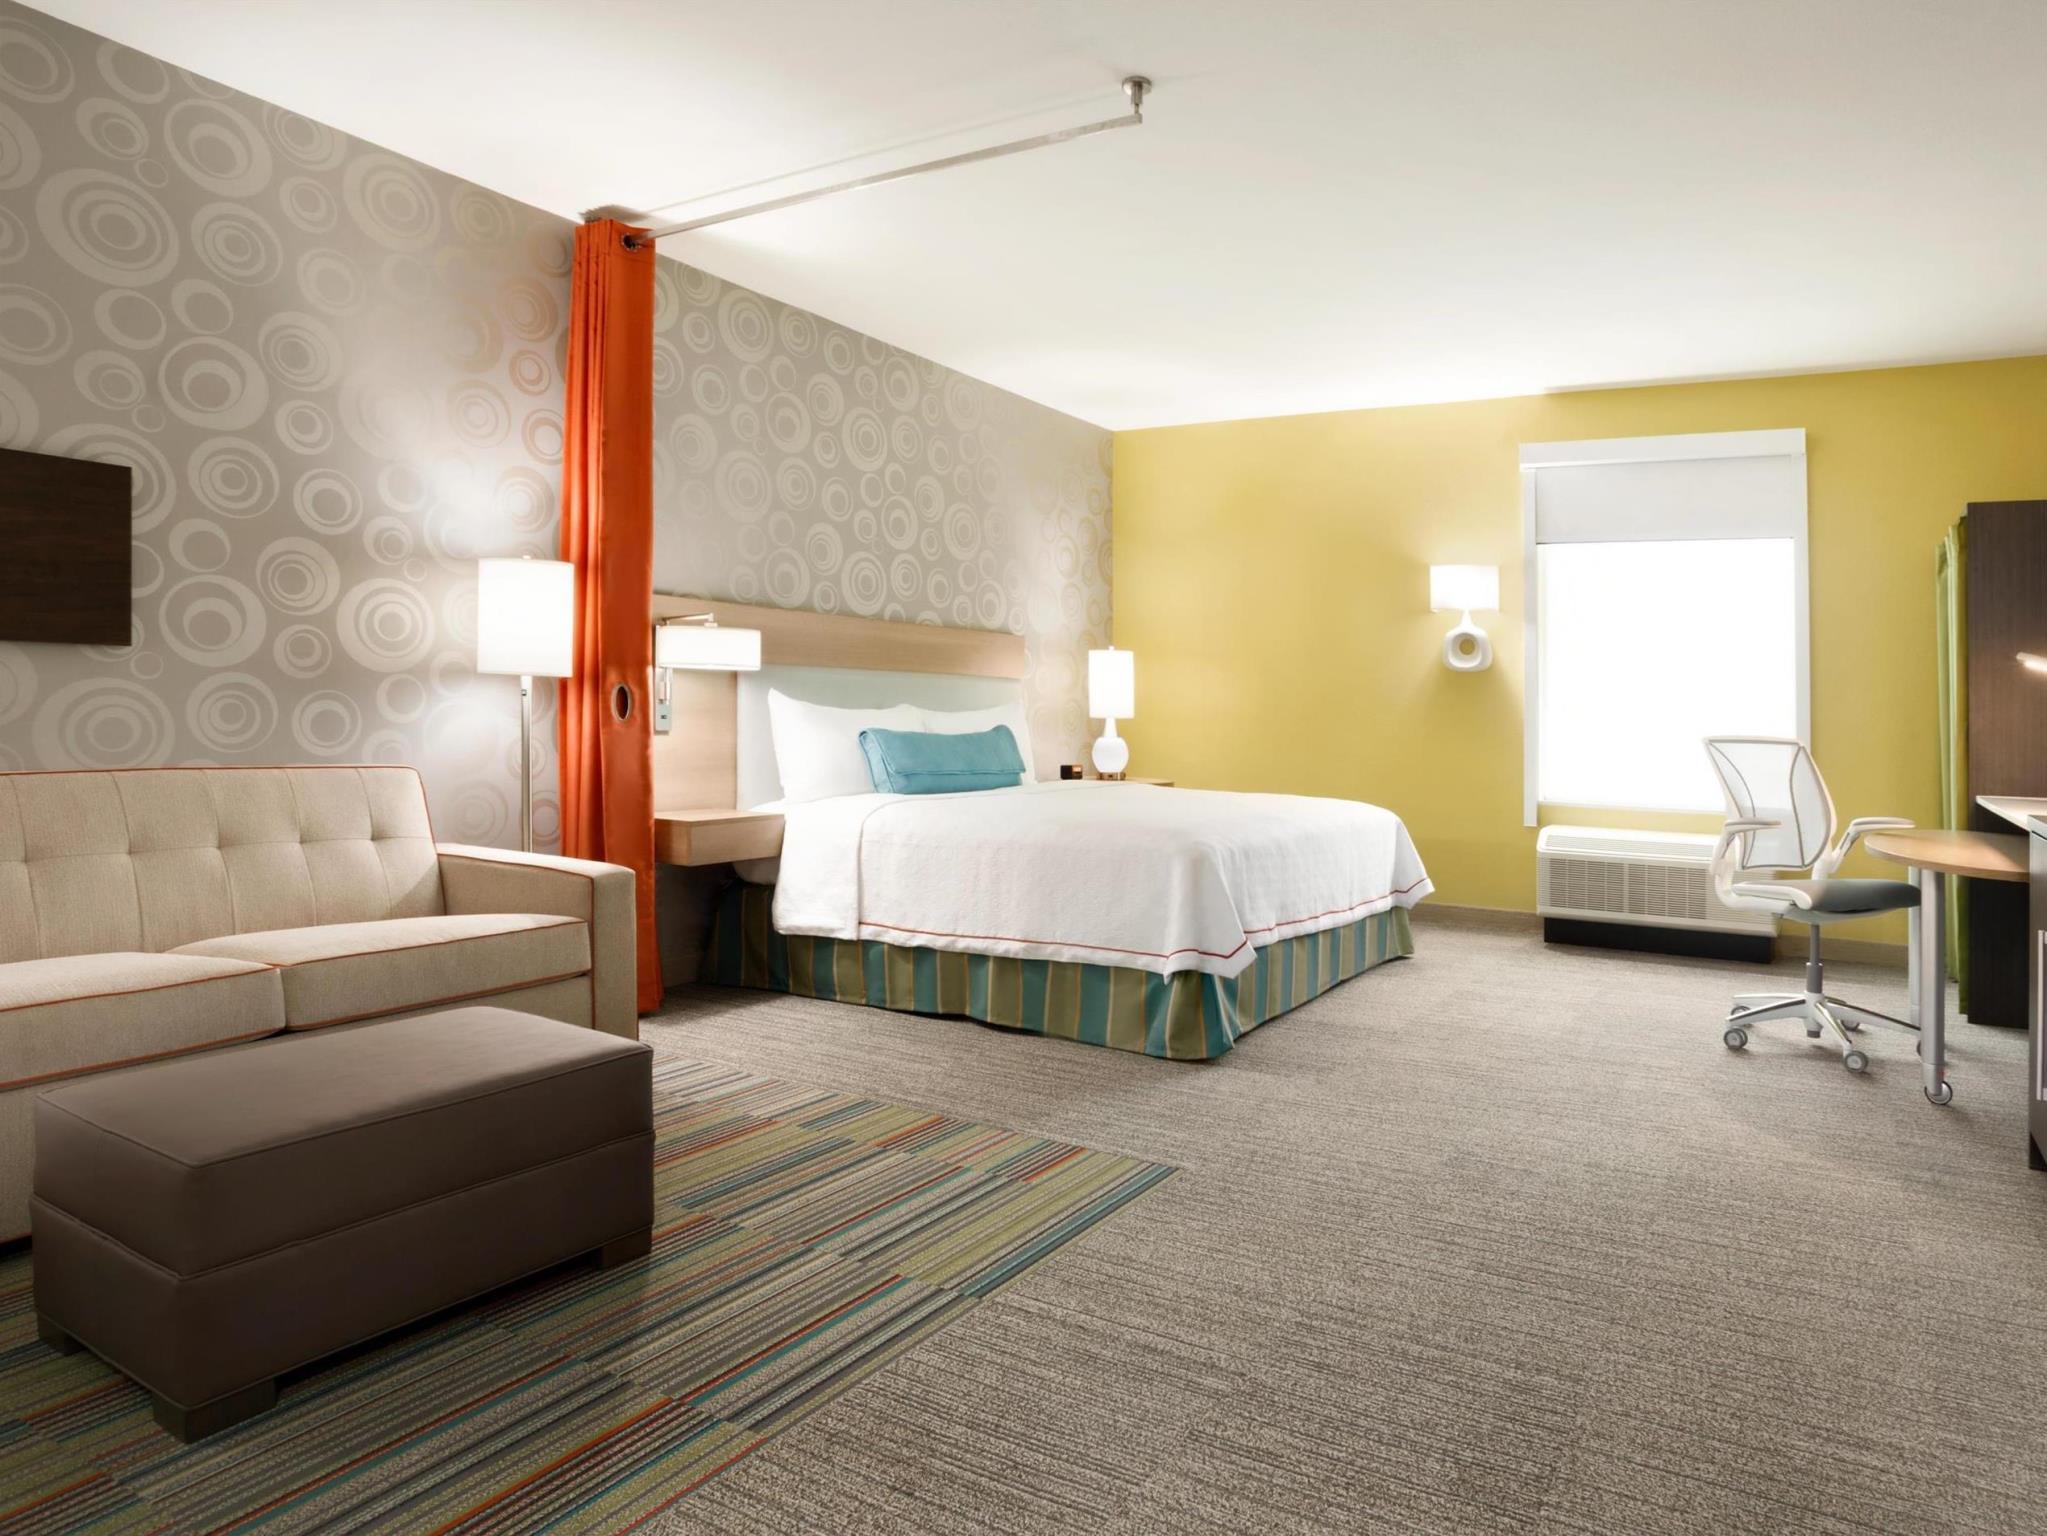 Home2 Suites by Hilton Houston Webster, Harris